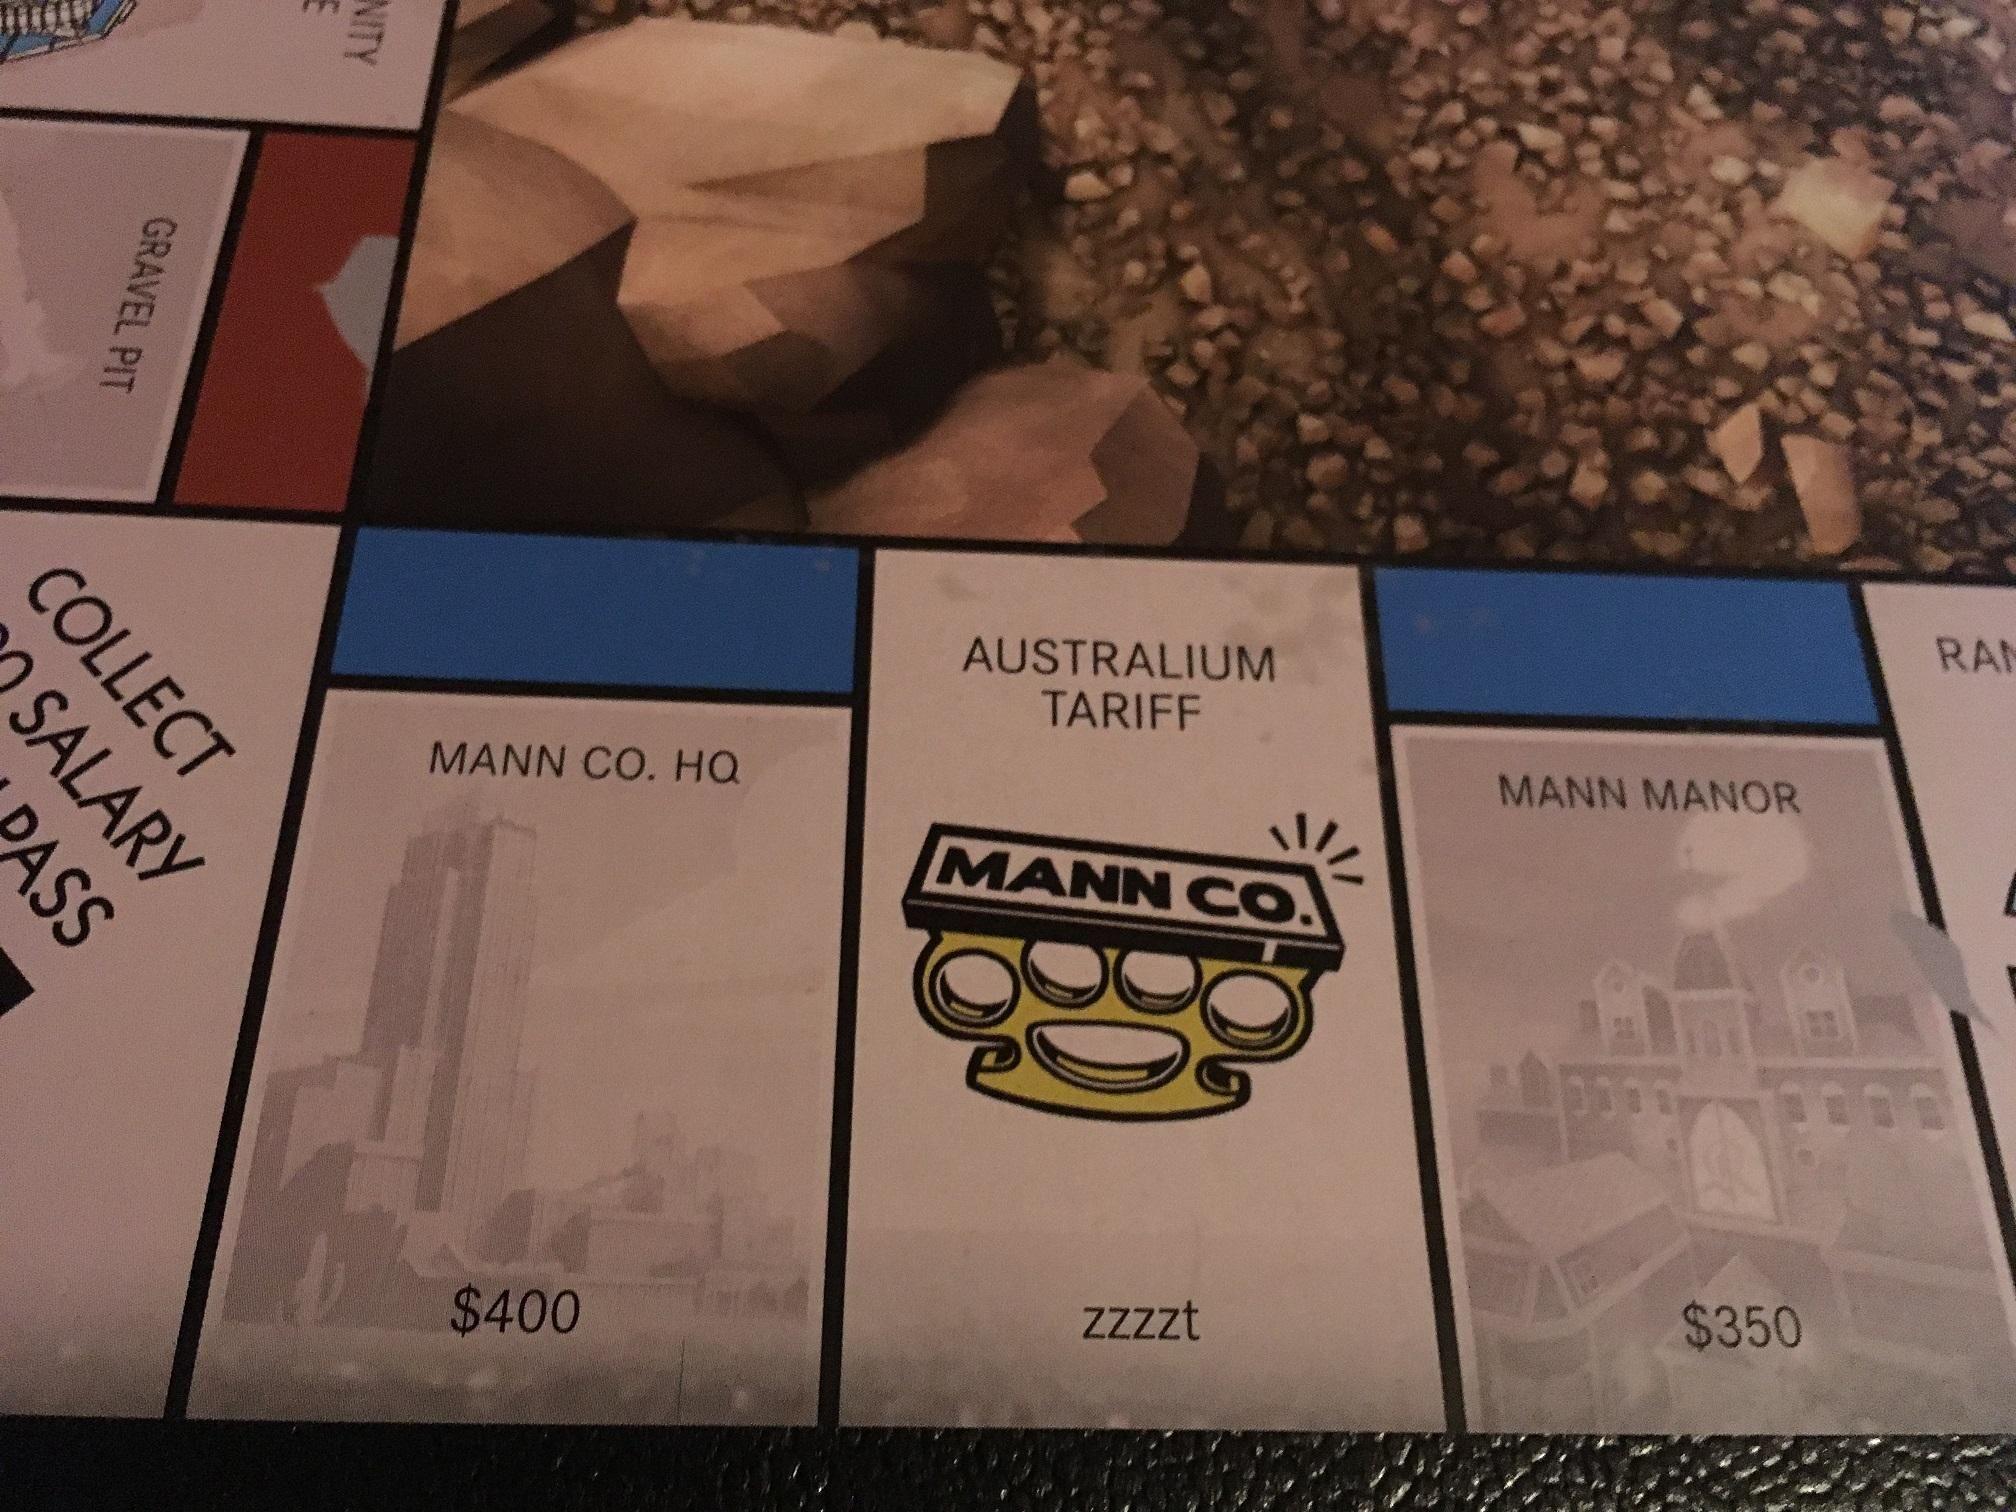 australium tariff tf2 monopoly misprint zzzzt games teamfortress2 steam tf2 steamnewrelease gaming valve [ 2016 x 1512 Pixel ]